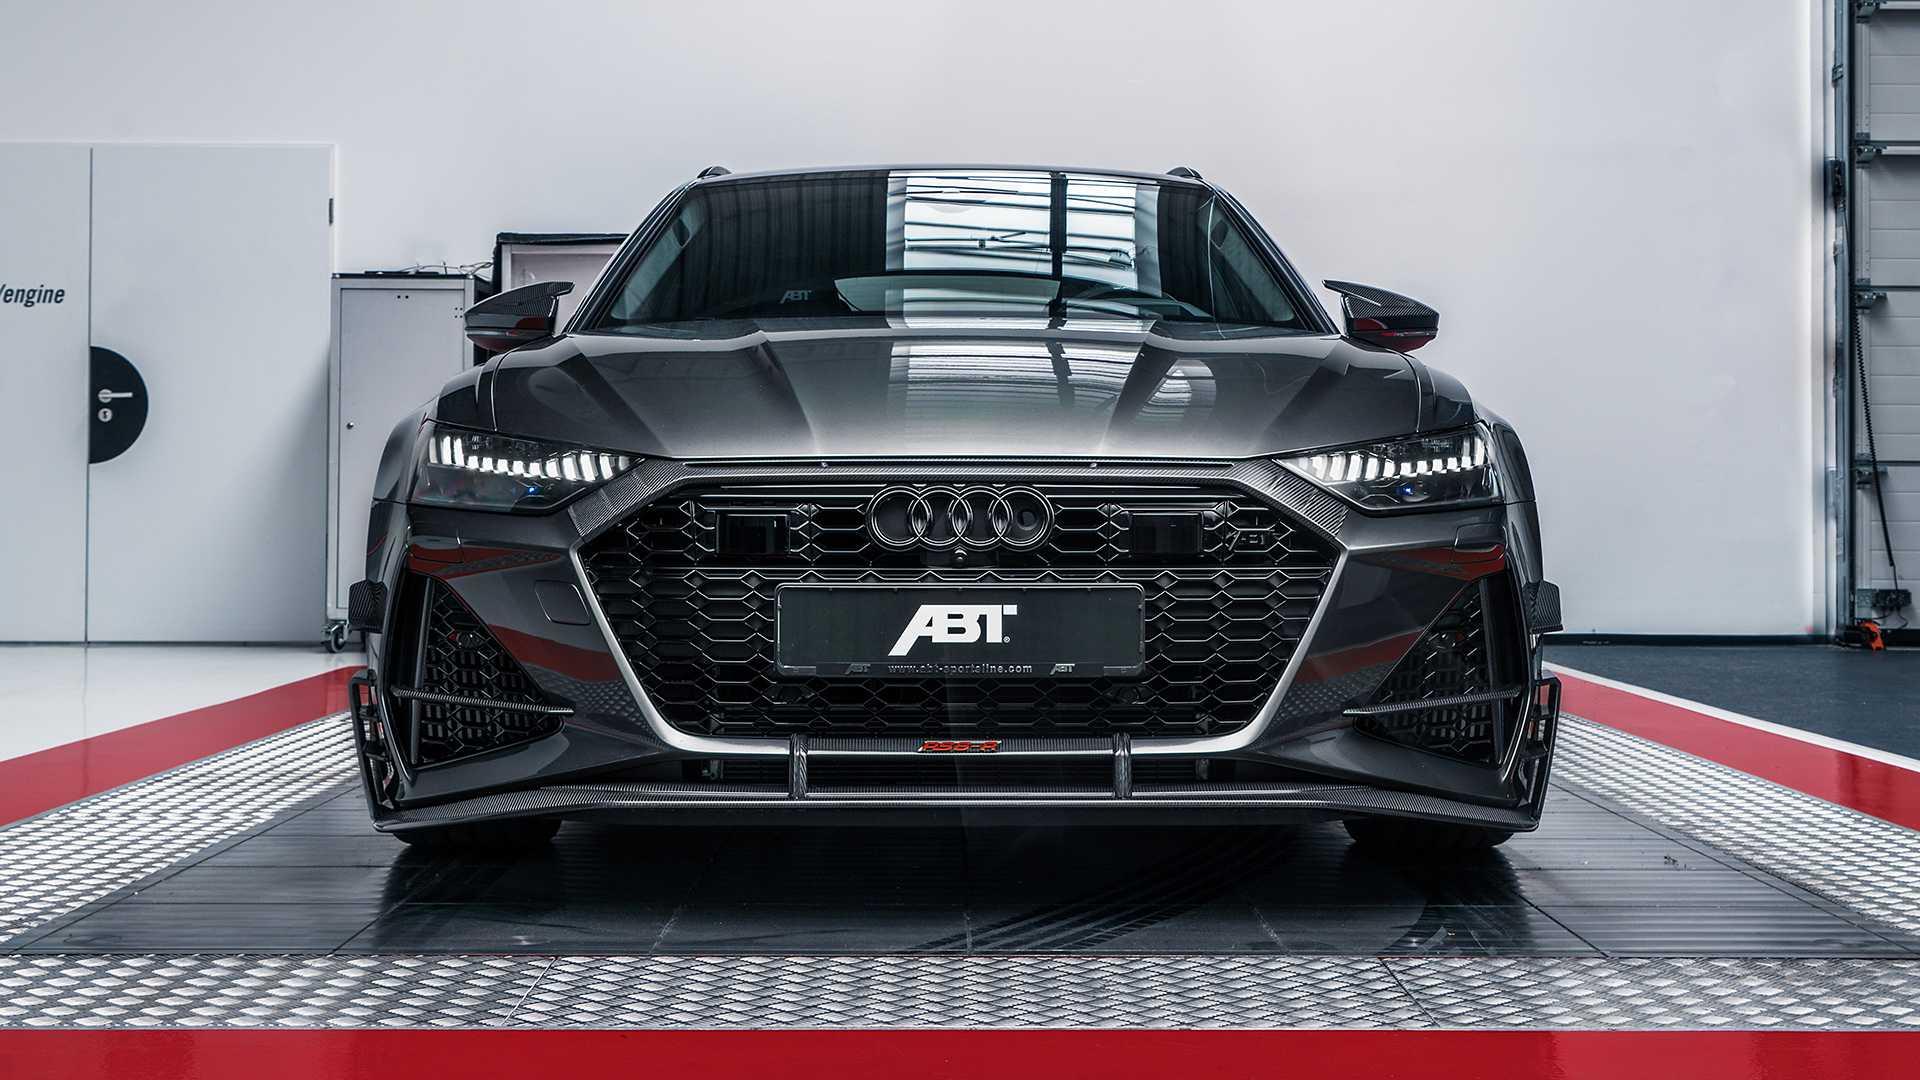 Dit kost de ABT Audi RS6-R in Nederland! - Hartvoorautos.nl